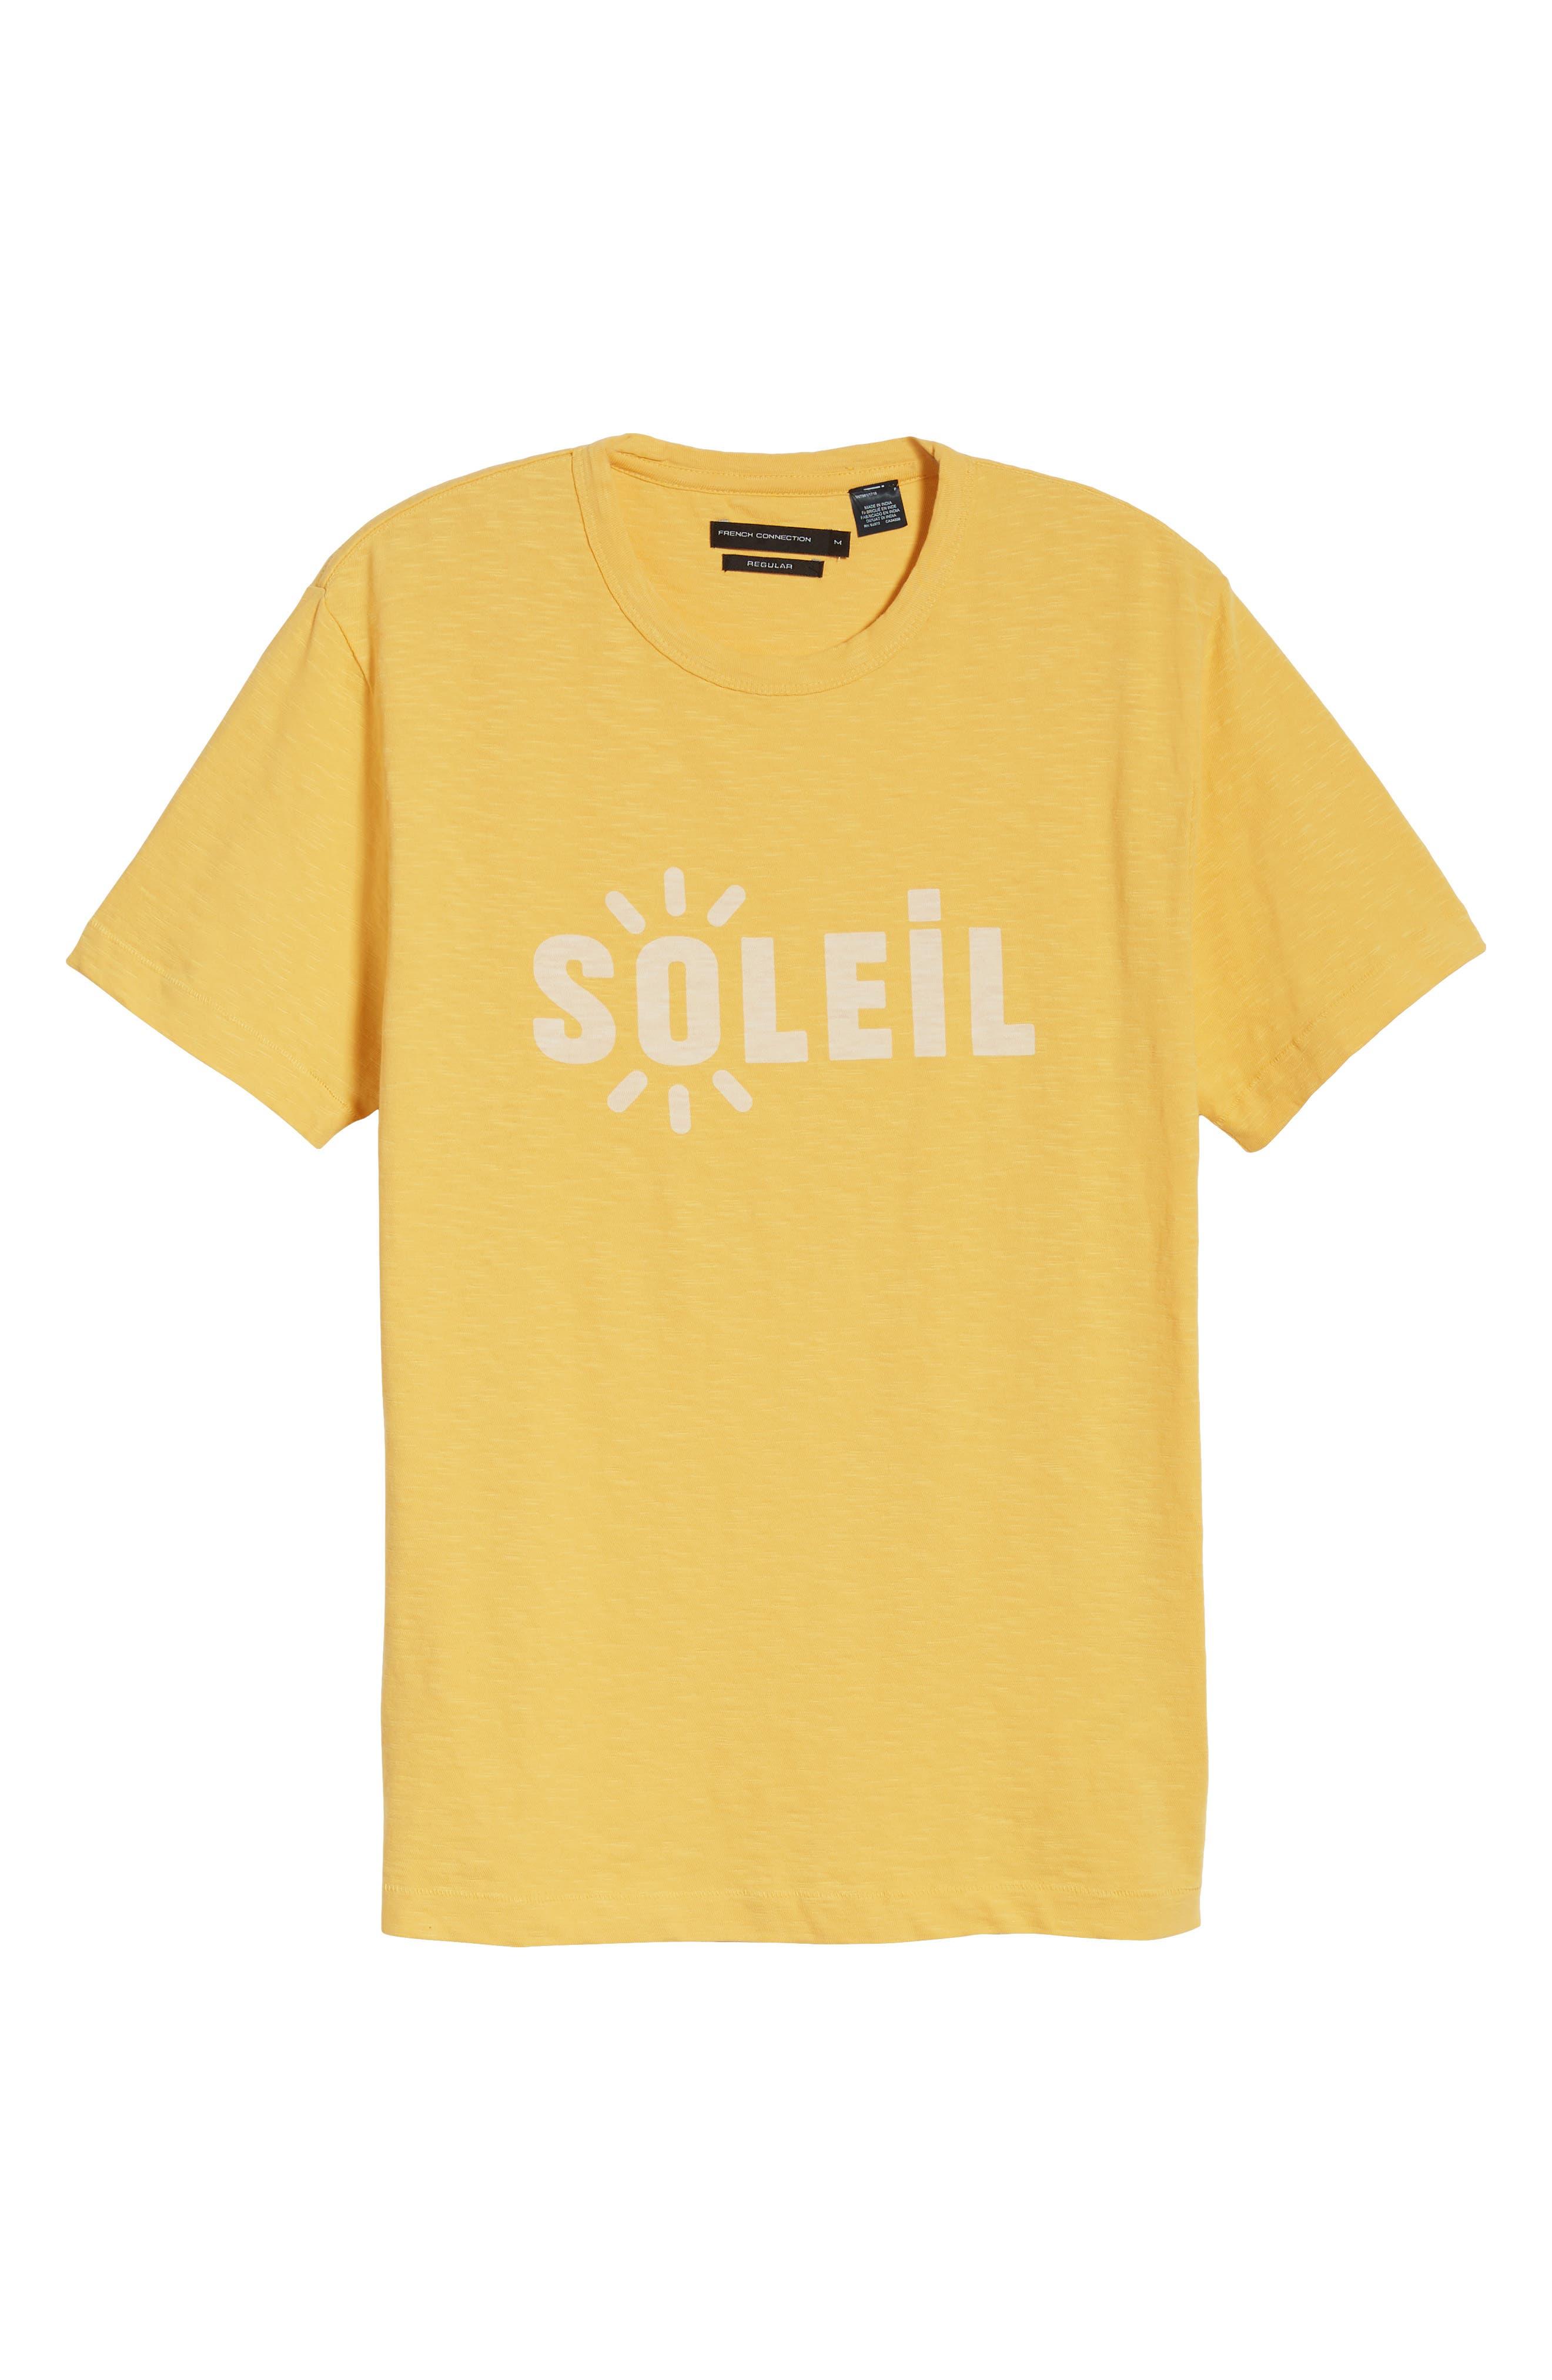 Soleil T-Shirt,                             Alternate thumbnail 6, color,                             Banana